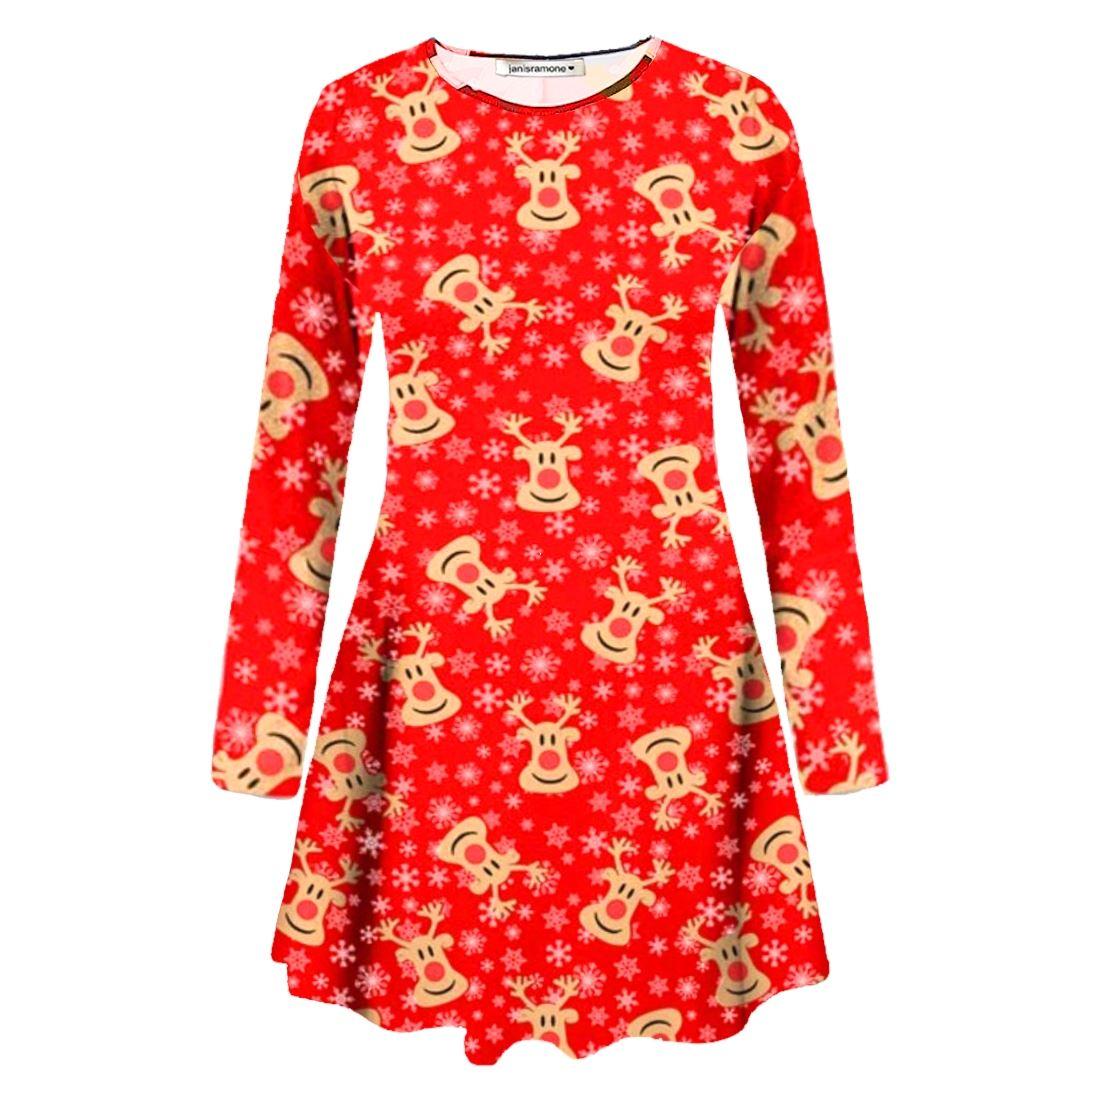 a514aeec98a2 New Women Girls Kids Snowman Reindeer Print Flare Christmas Mini Swing Dress  Top